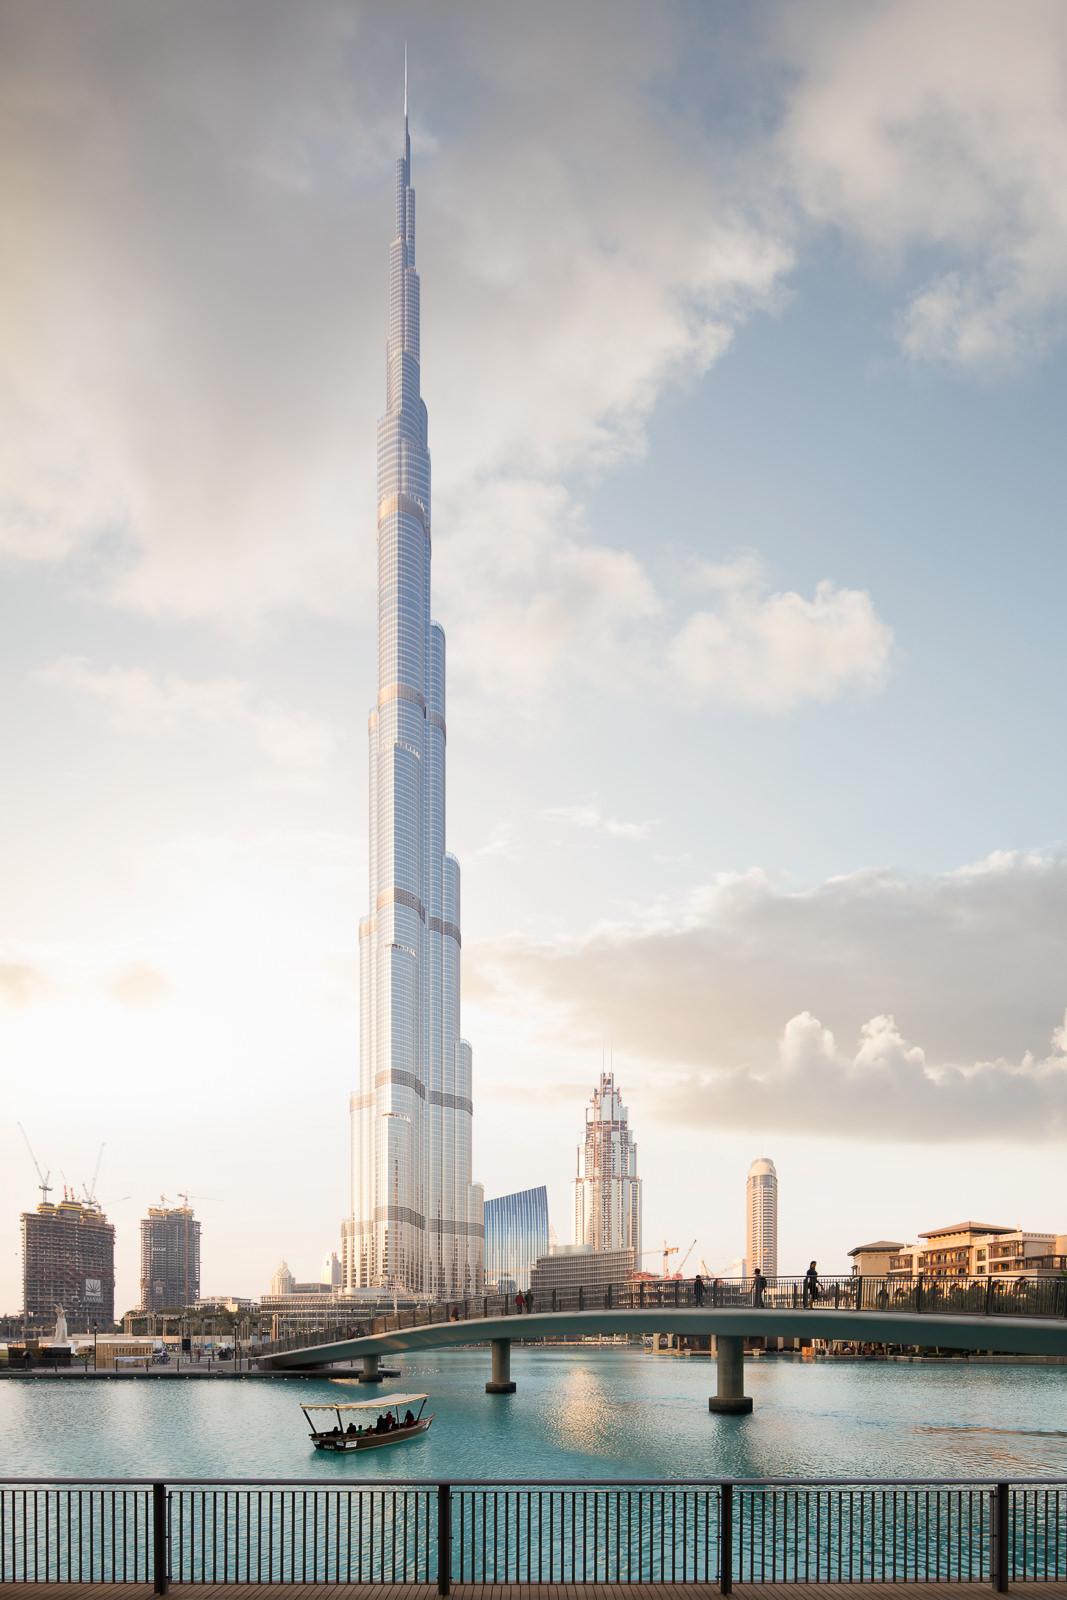 Burj Khalifa, Dubai, UAE - Skidmore, Owings and Merrill